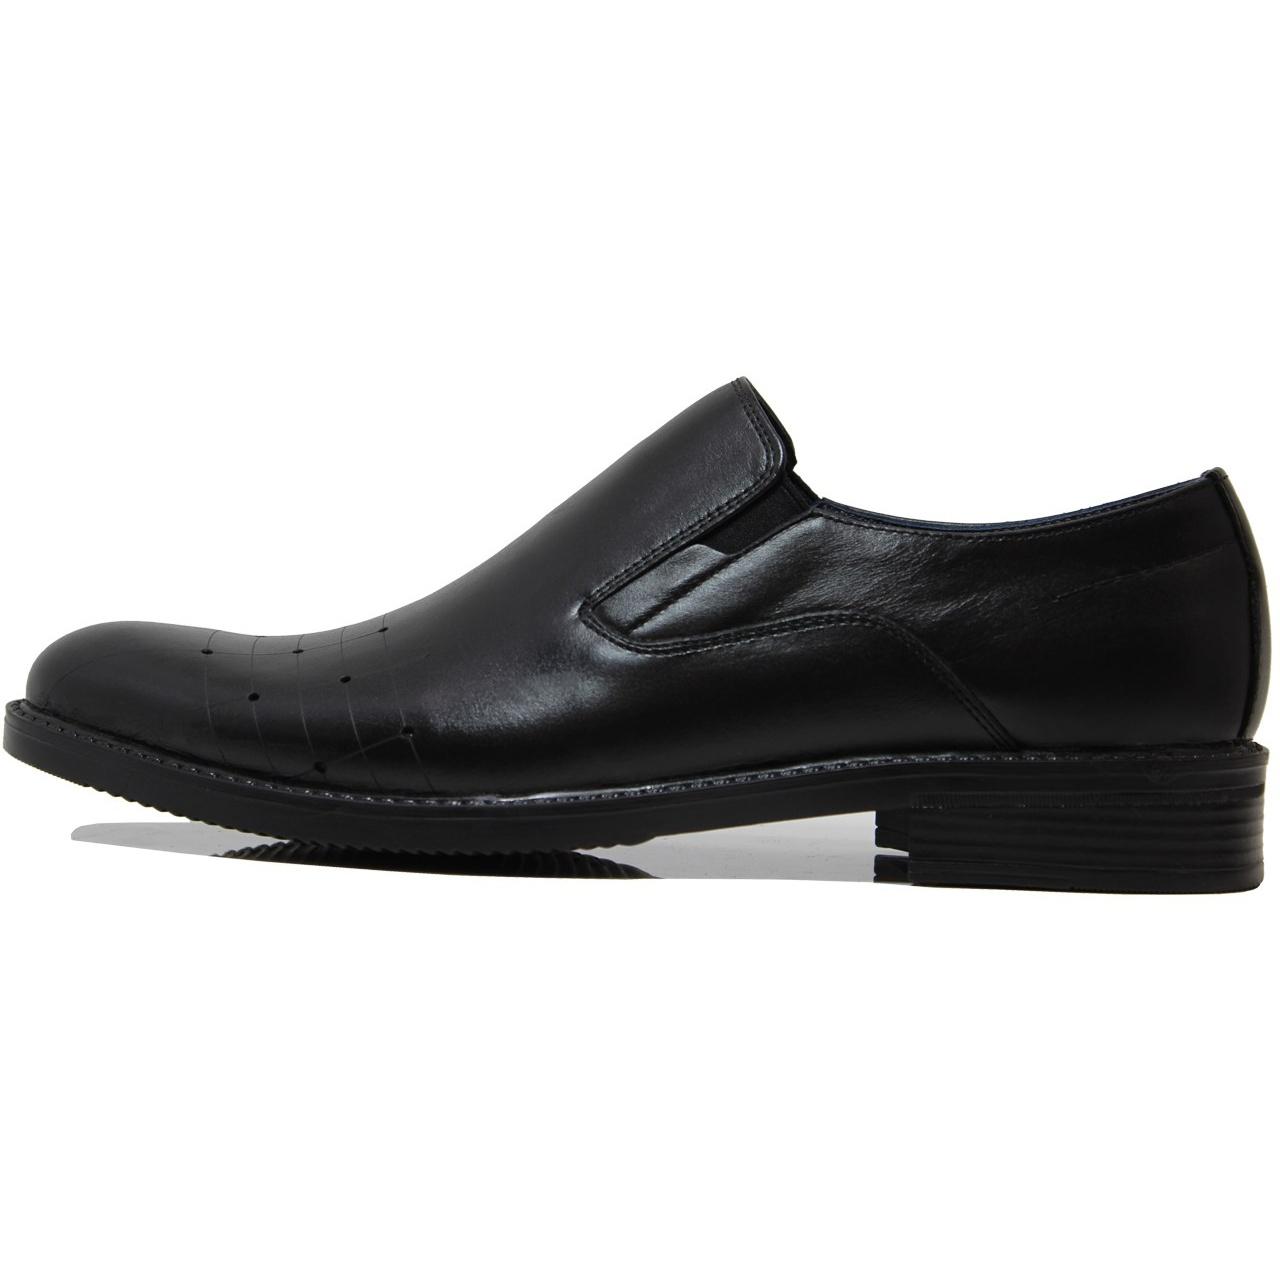 کفش مردانه چرم طبیعی ژست مدل 3041